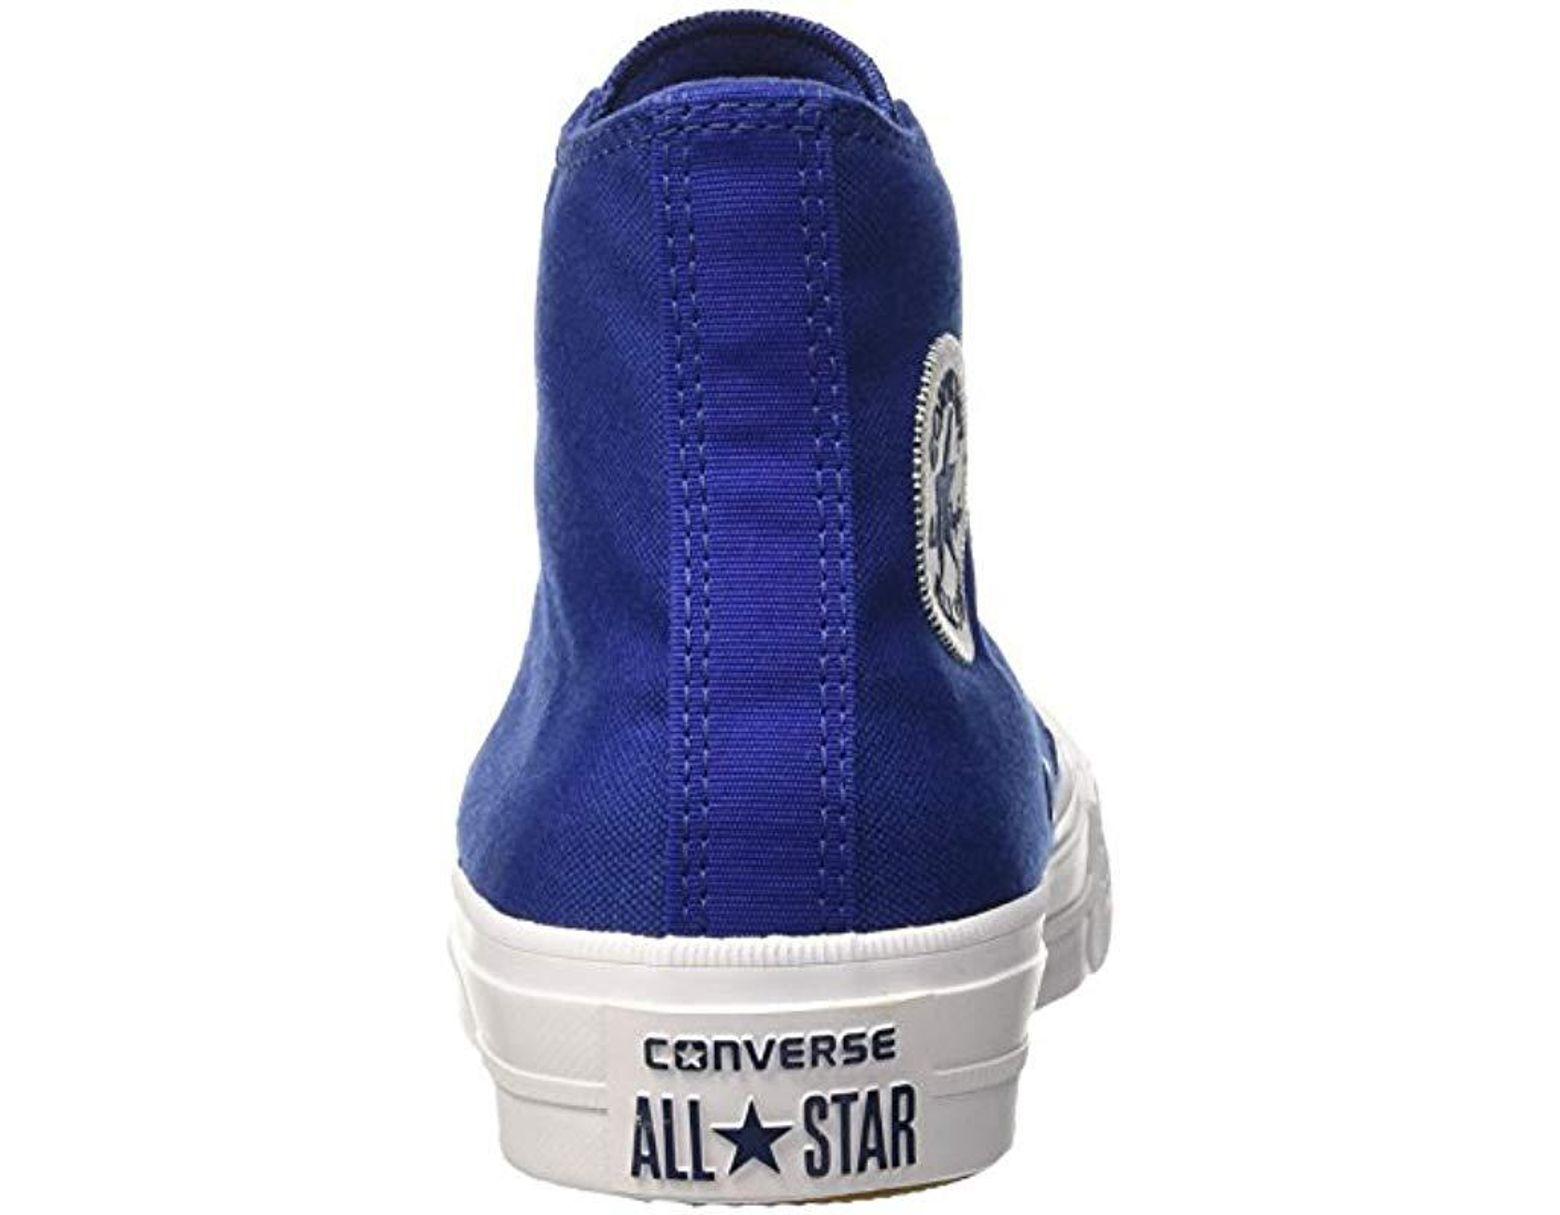 Unisex Star Altas Ii All Chuck HighZapatillas Taylor n8PO0kw